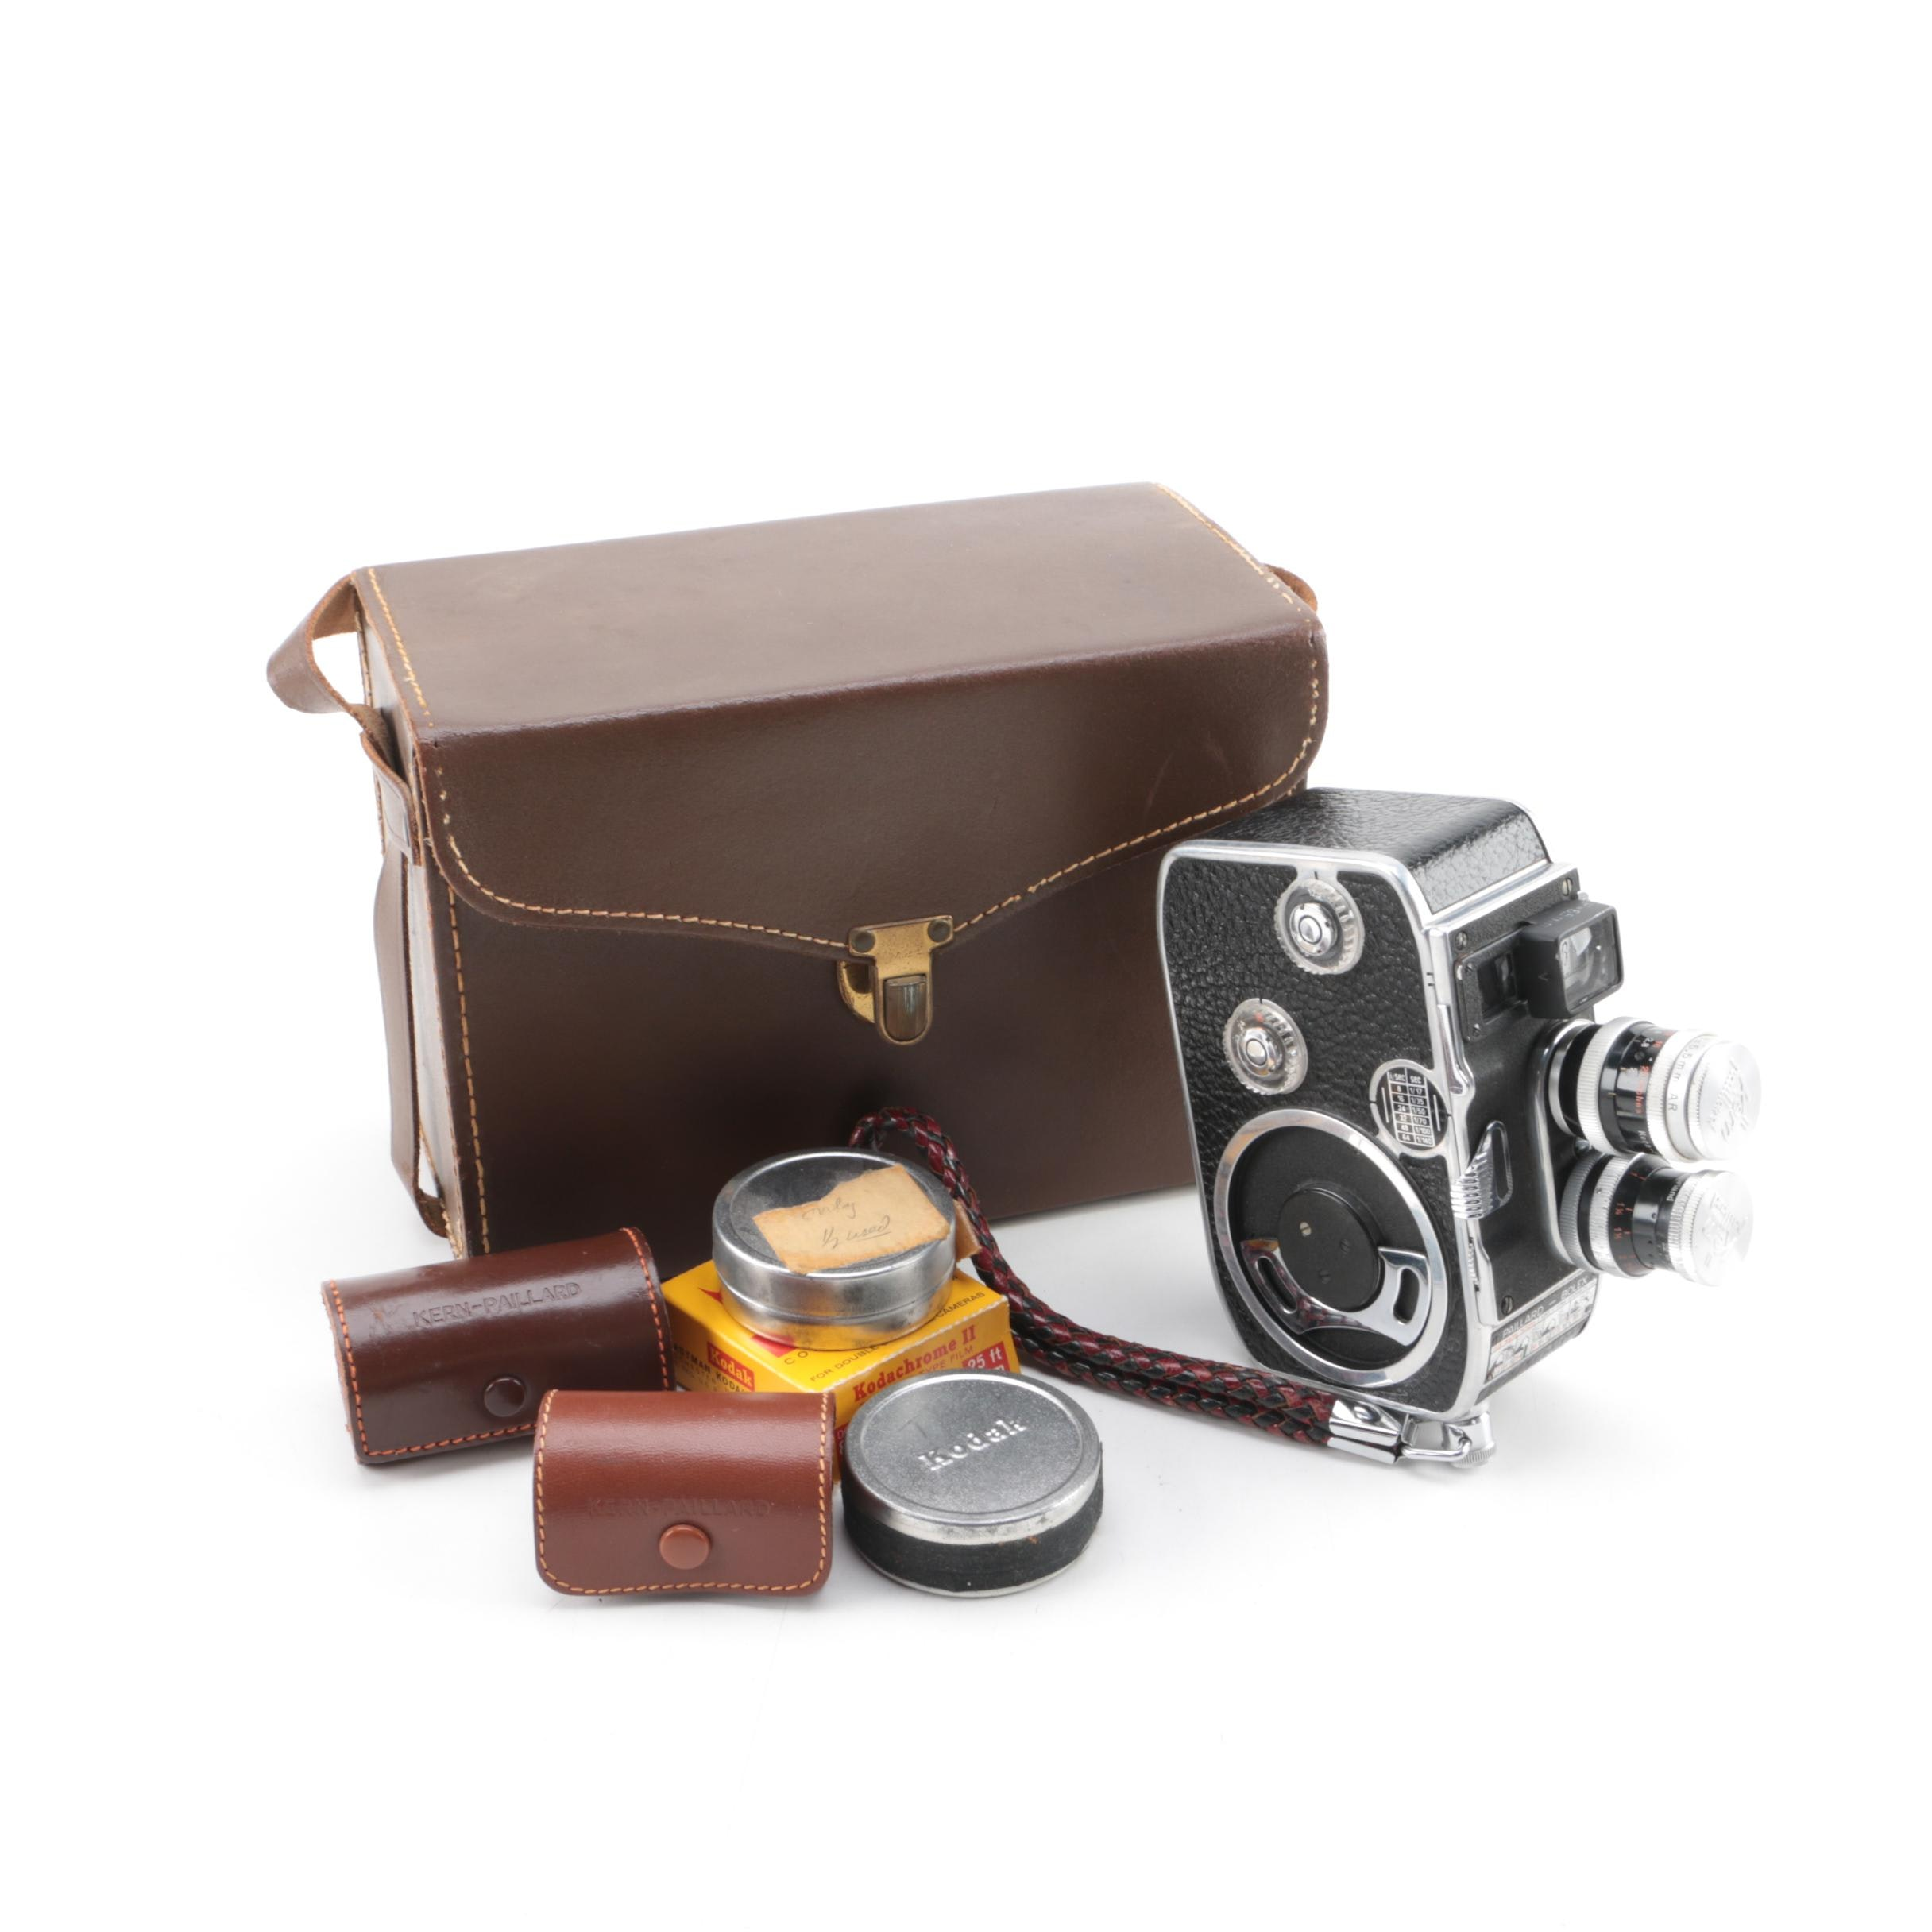 Vintage Paillard-Bolex B8 Movie Camera with Bag and Accessories